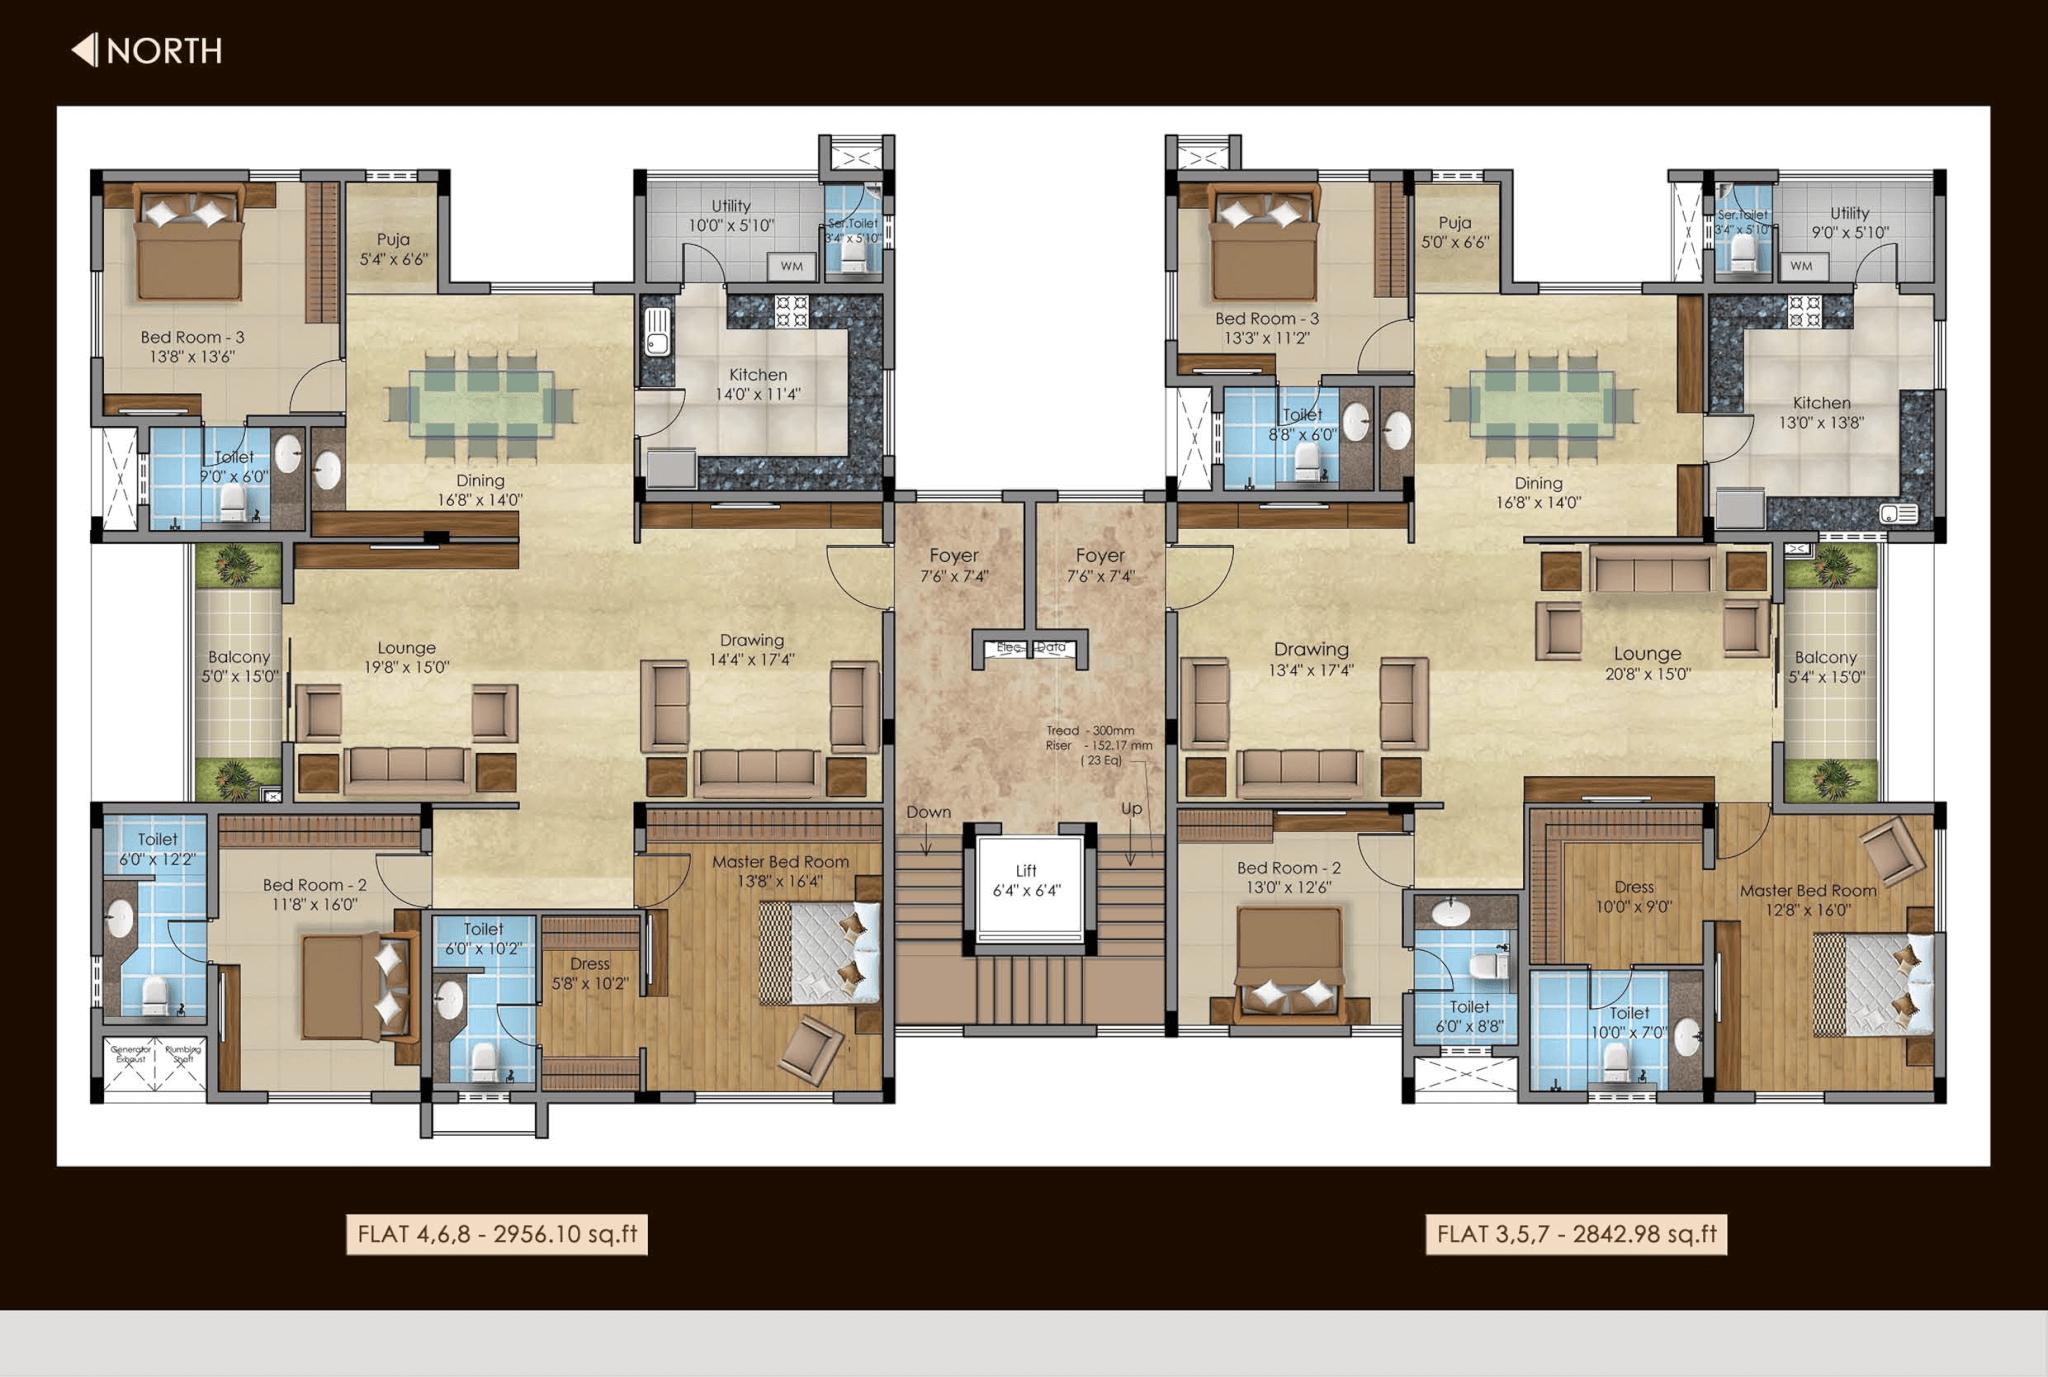 Apartments for sale in thiruvanmiyur 3 bedroom lavish homes for 3 bedroom apartments in chennai